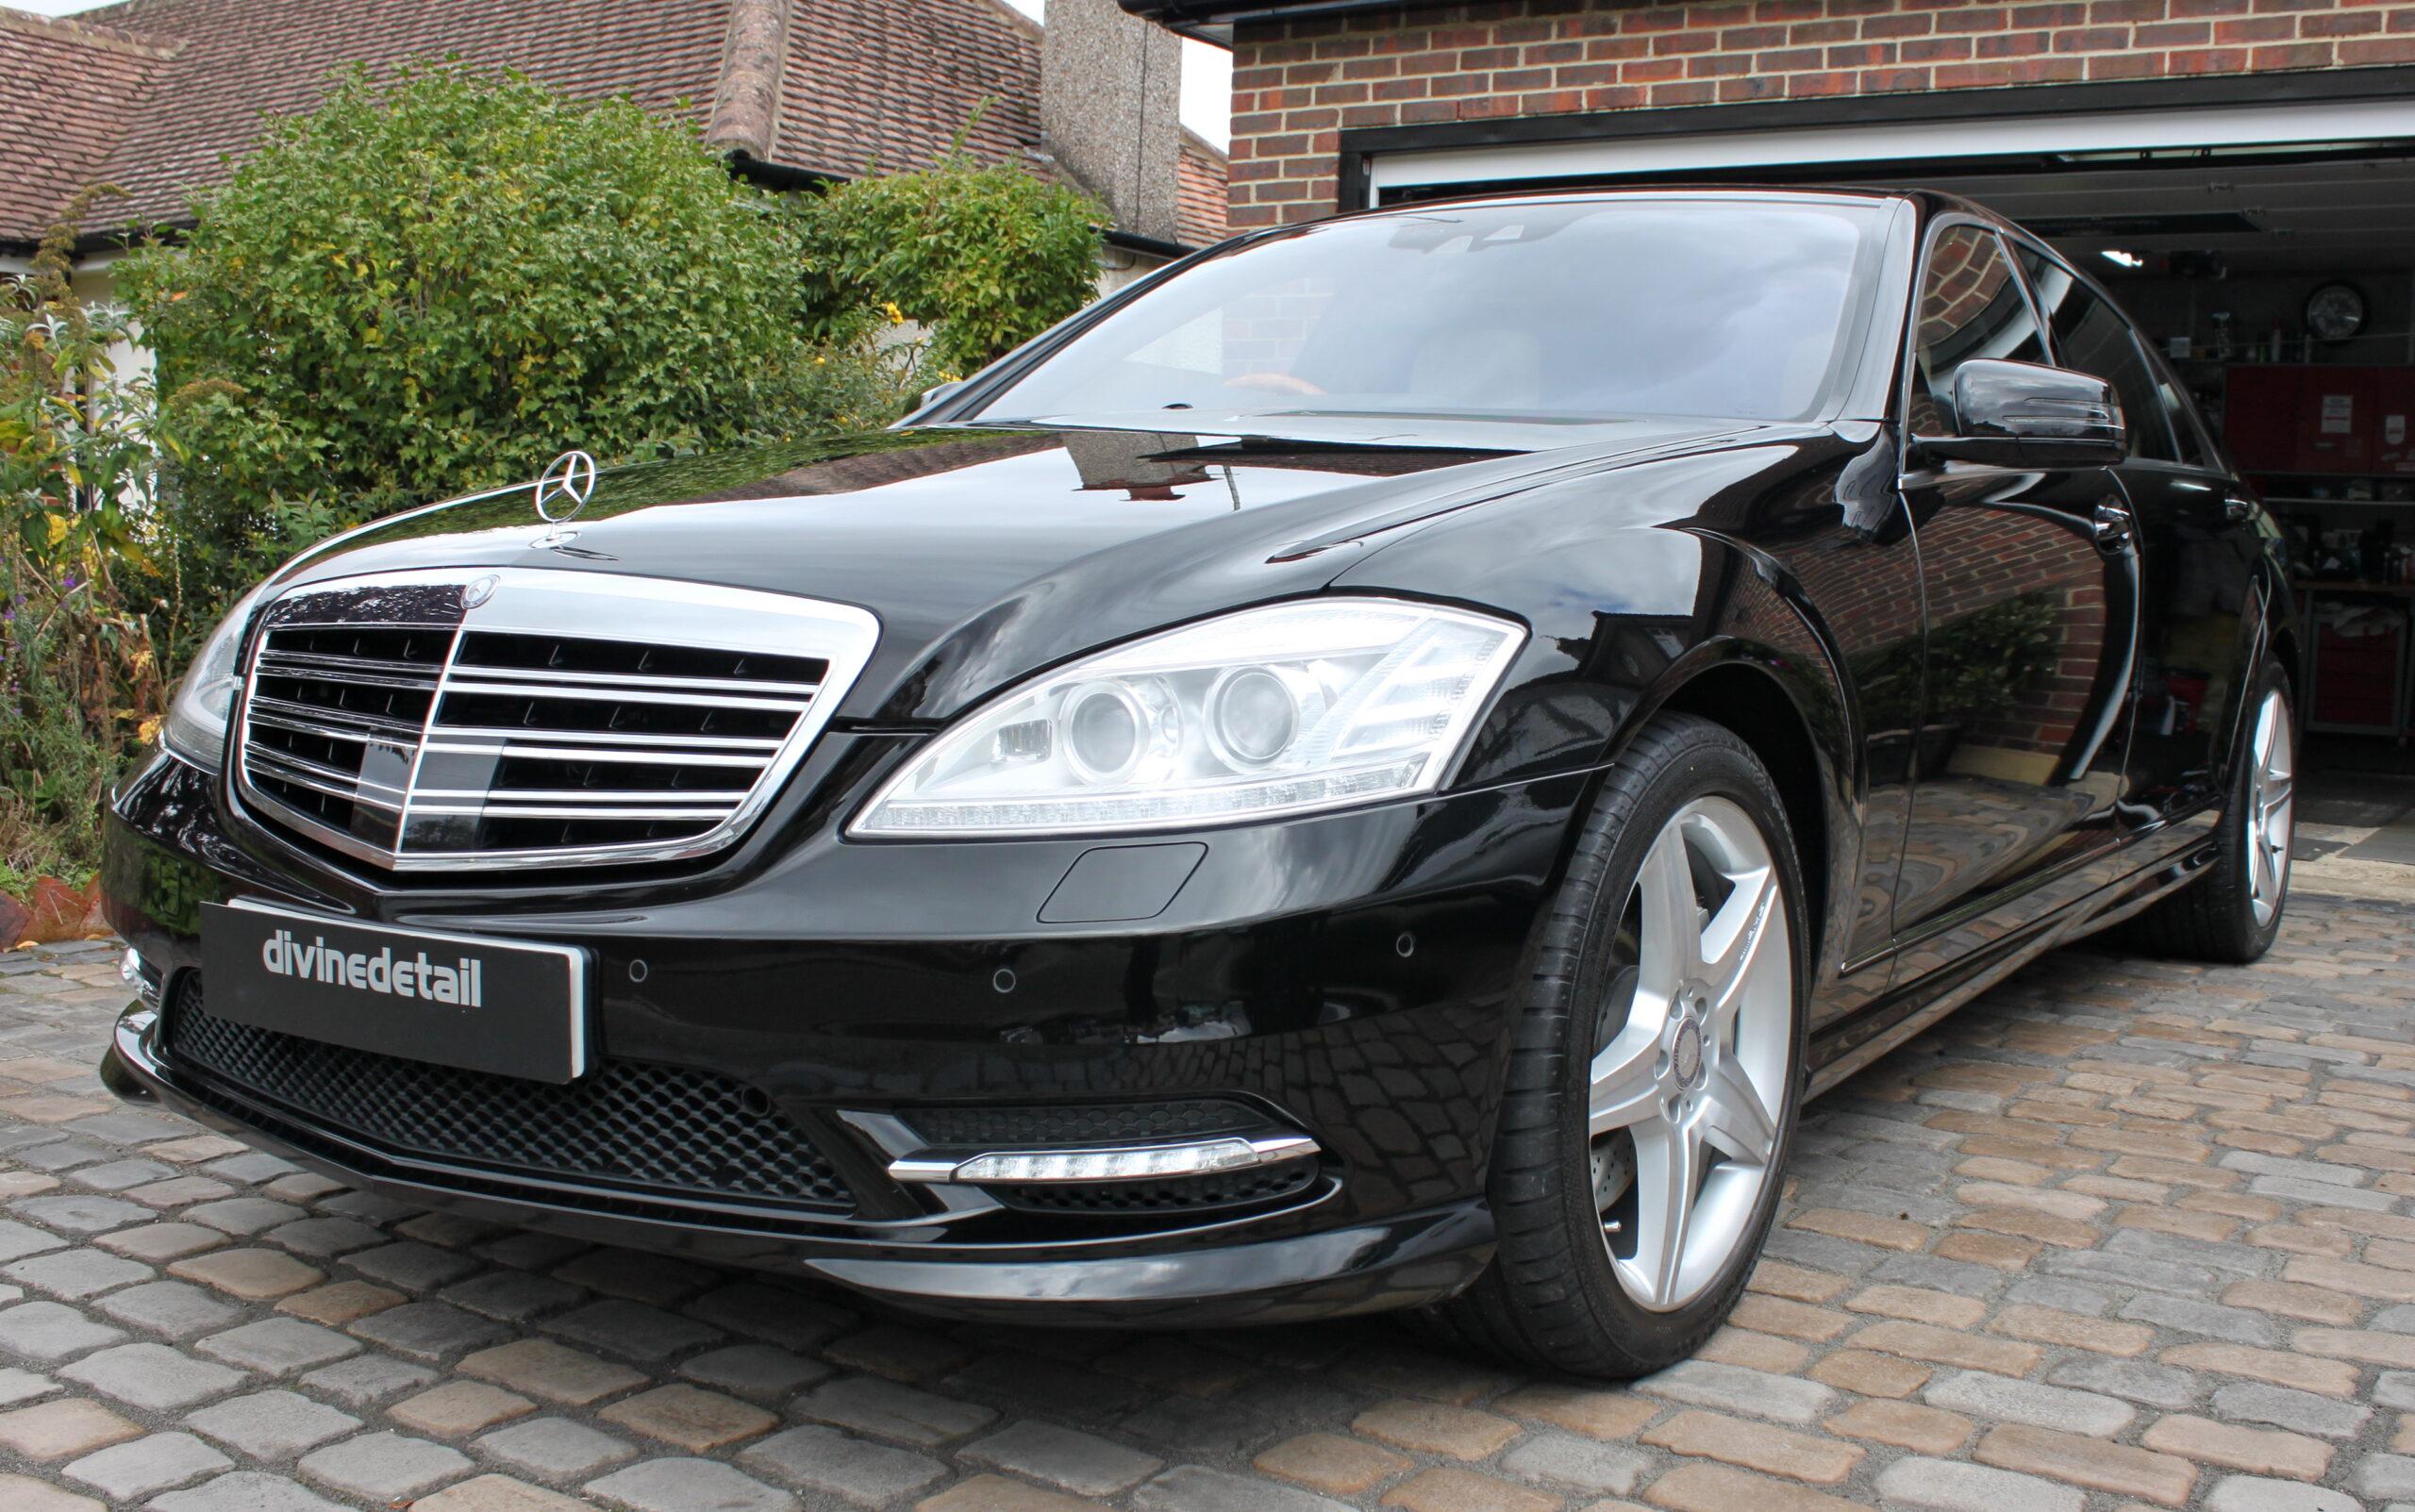 Mercedes S600 detailing